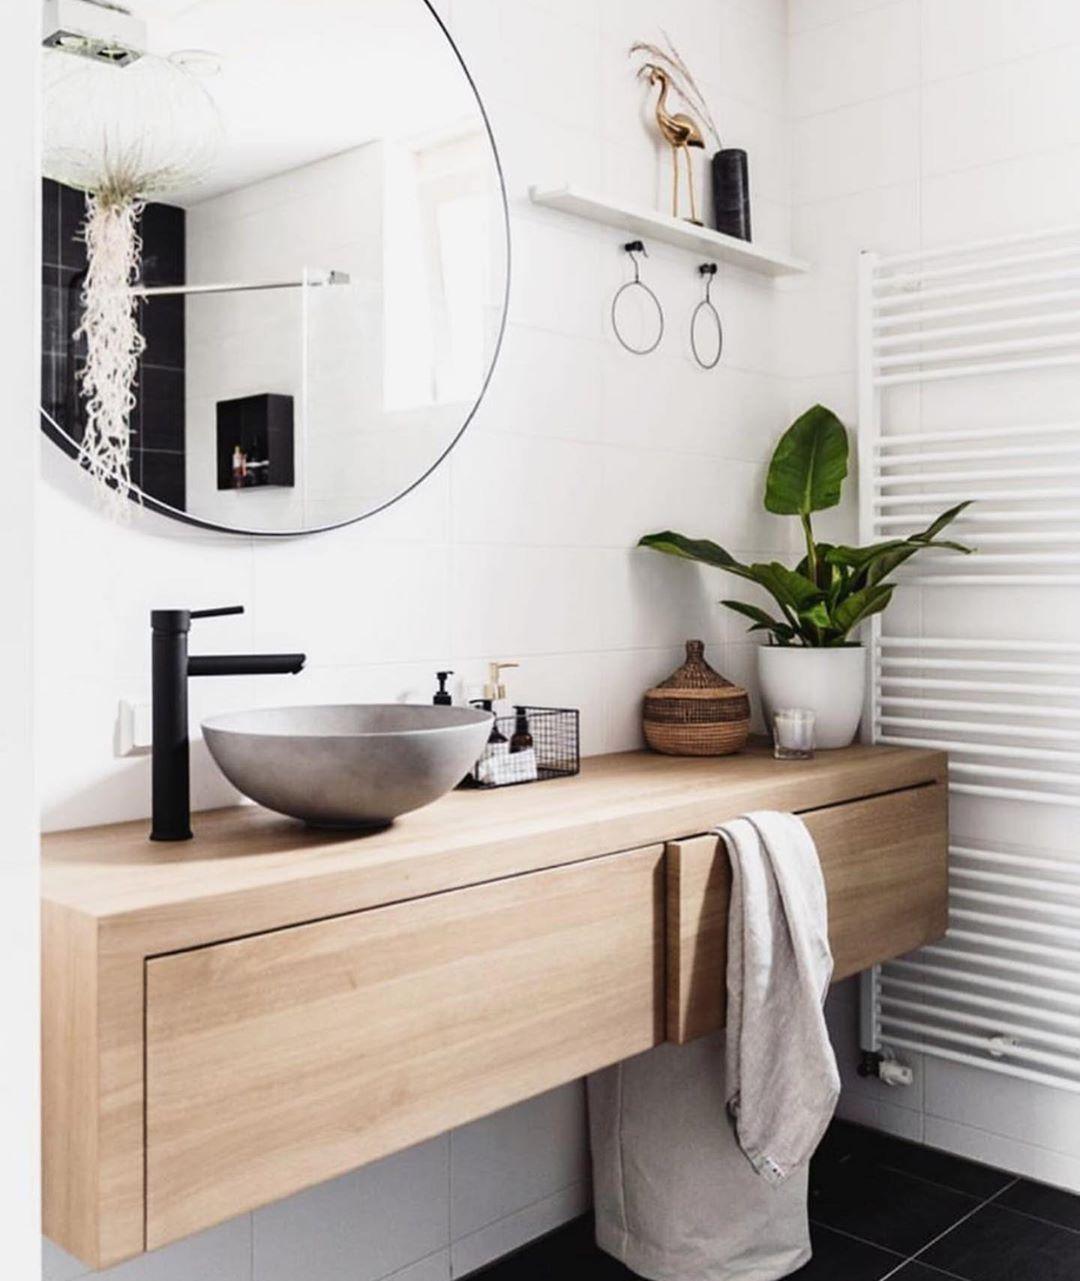 "Inspi_Deco on Instagram: ""▪️ Bathroom Design 😍  Inspi @muk.vl  #picoftheday #toilette #wc #bathroom #bathroomdecor #bathroomdesign #bathroomideas #classy…"""